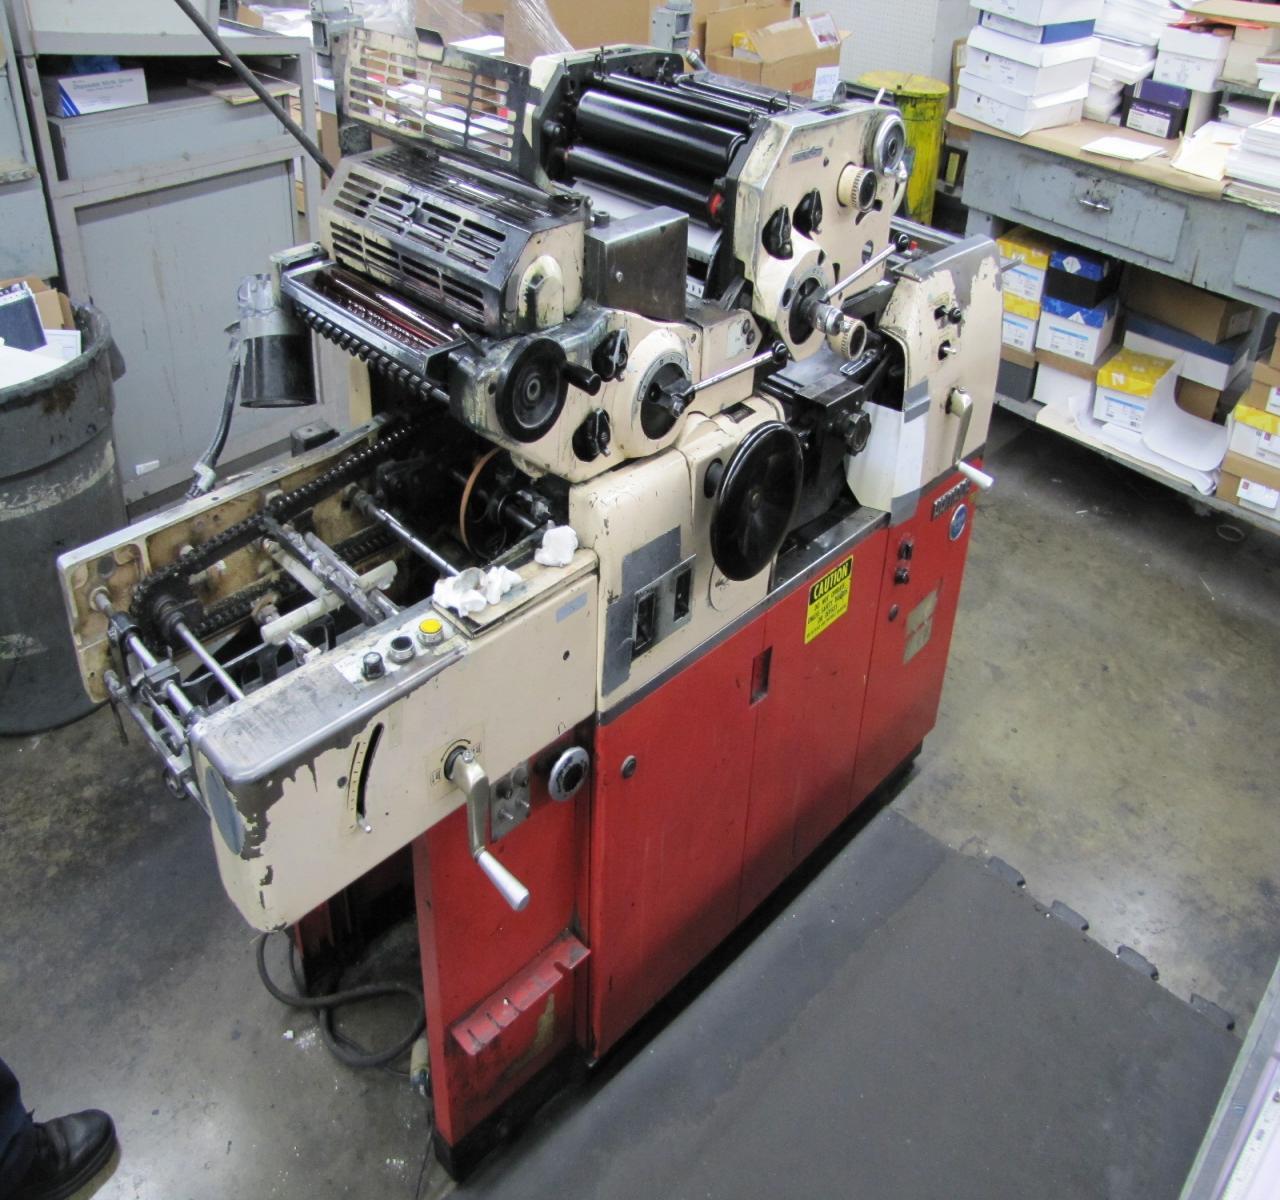 Color press printing - Hamada 665 Cd 2 Color Offset Printing Press